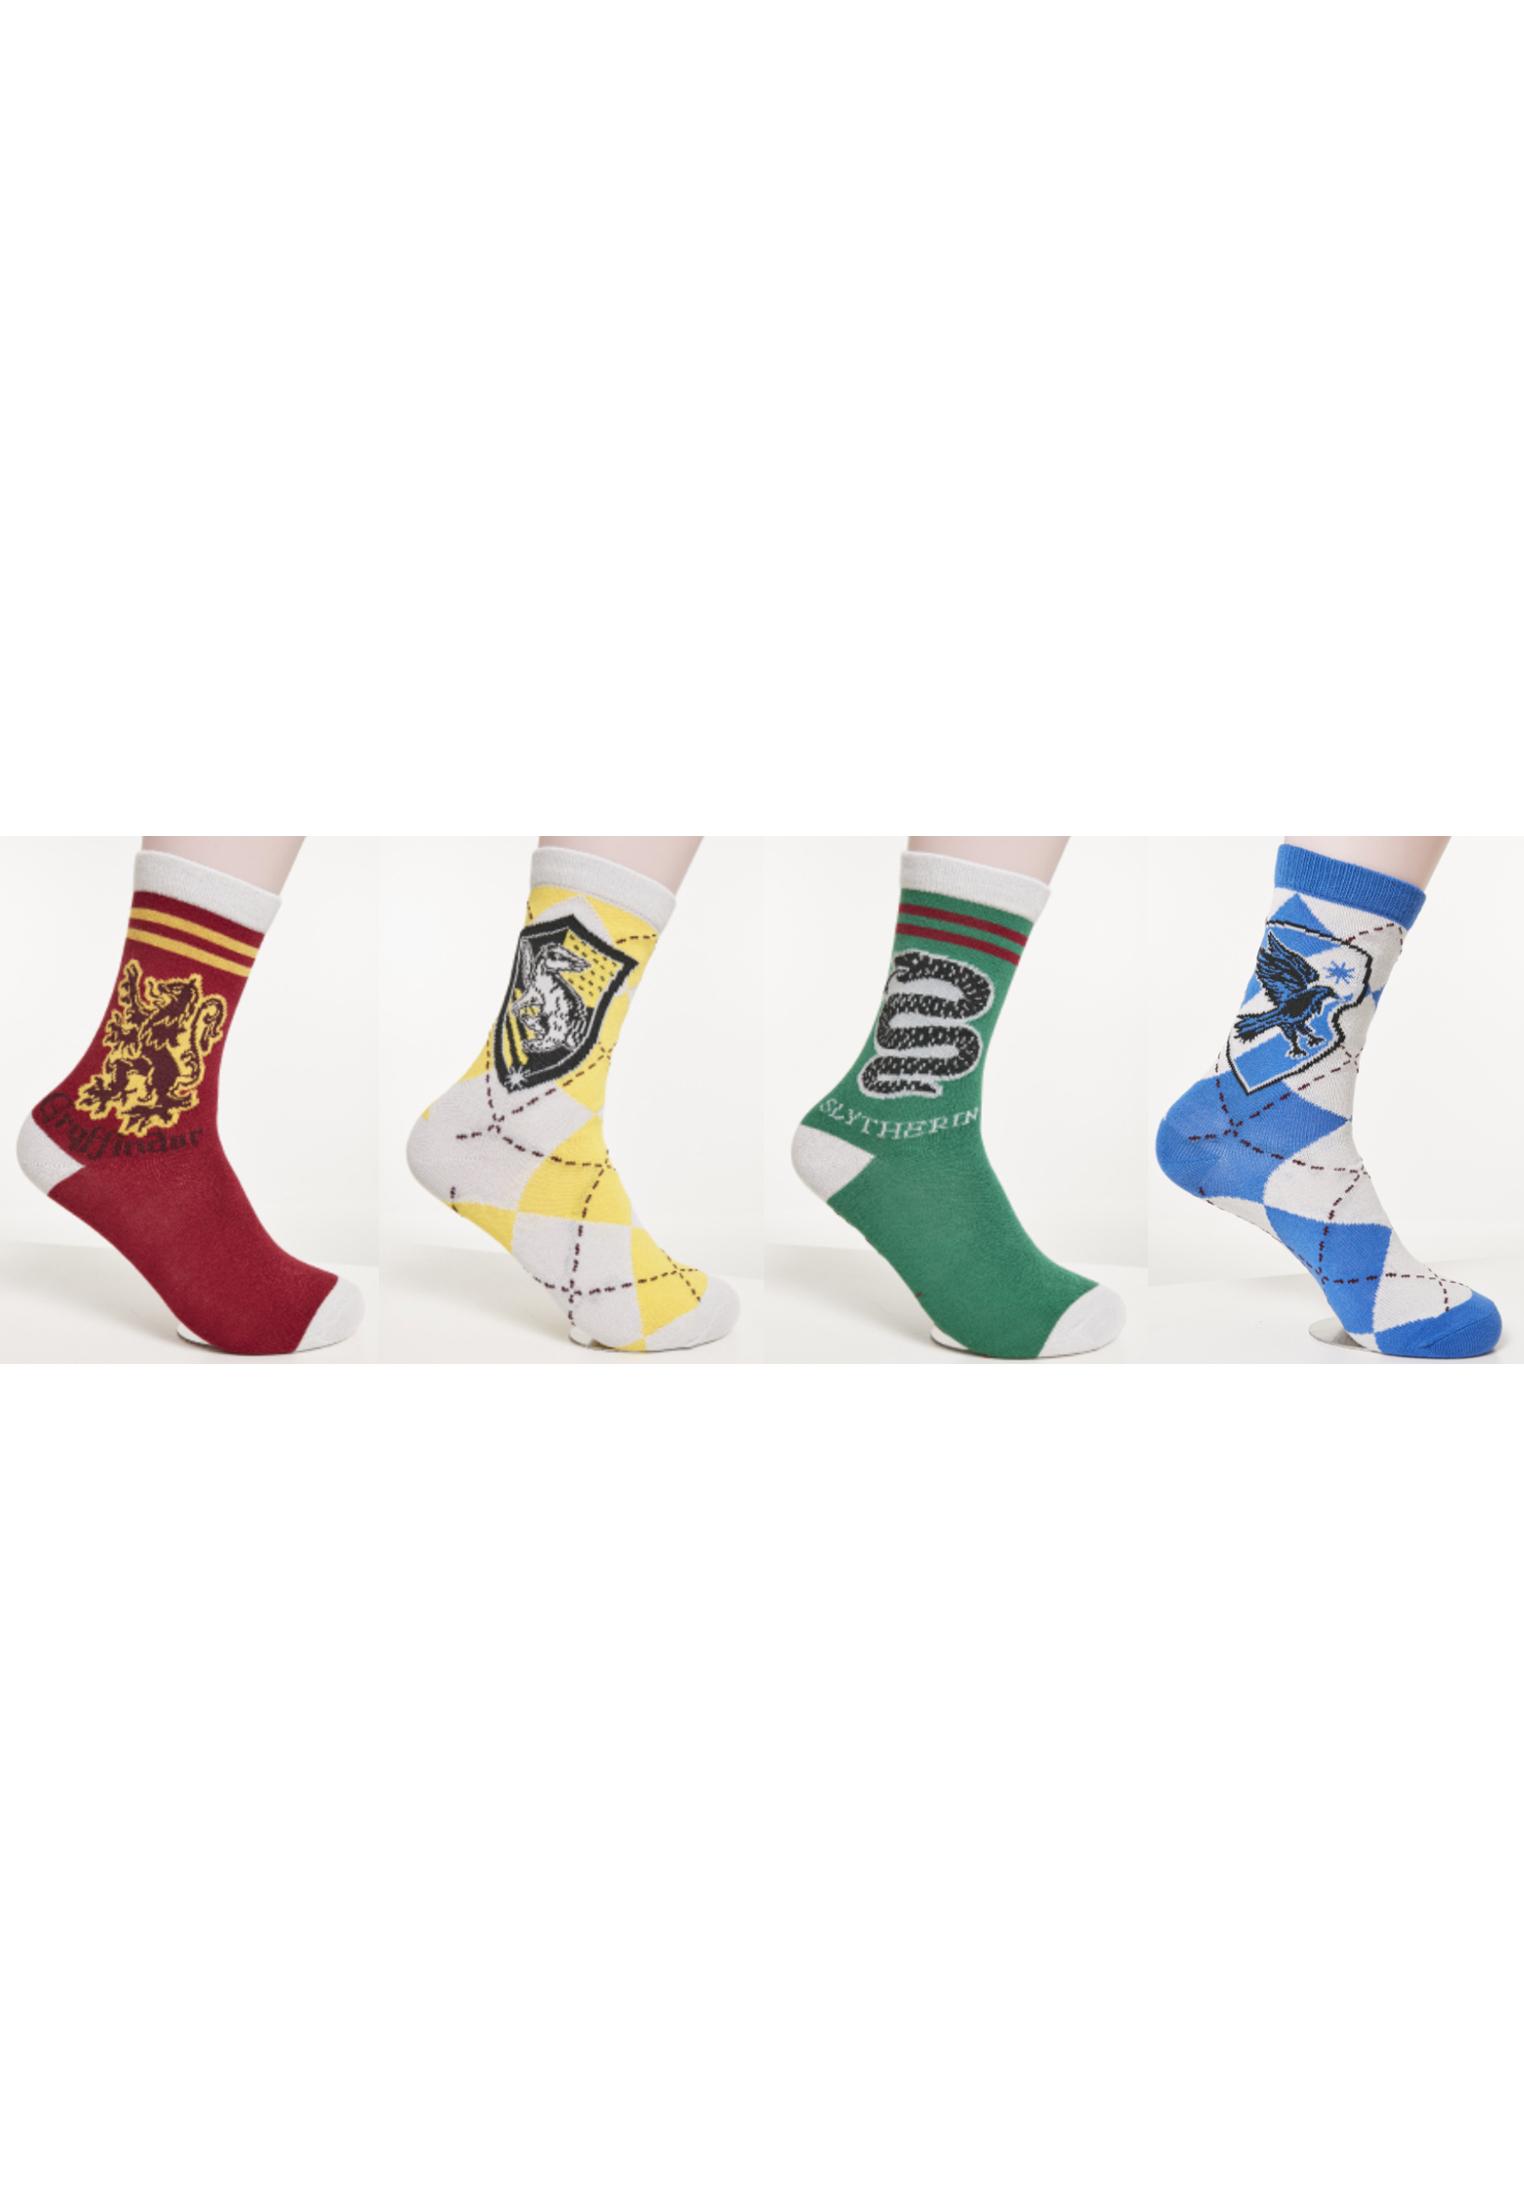 Urban Classics Harry Potter Team Socks 4-Pack multicolor - 47-50